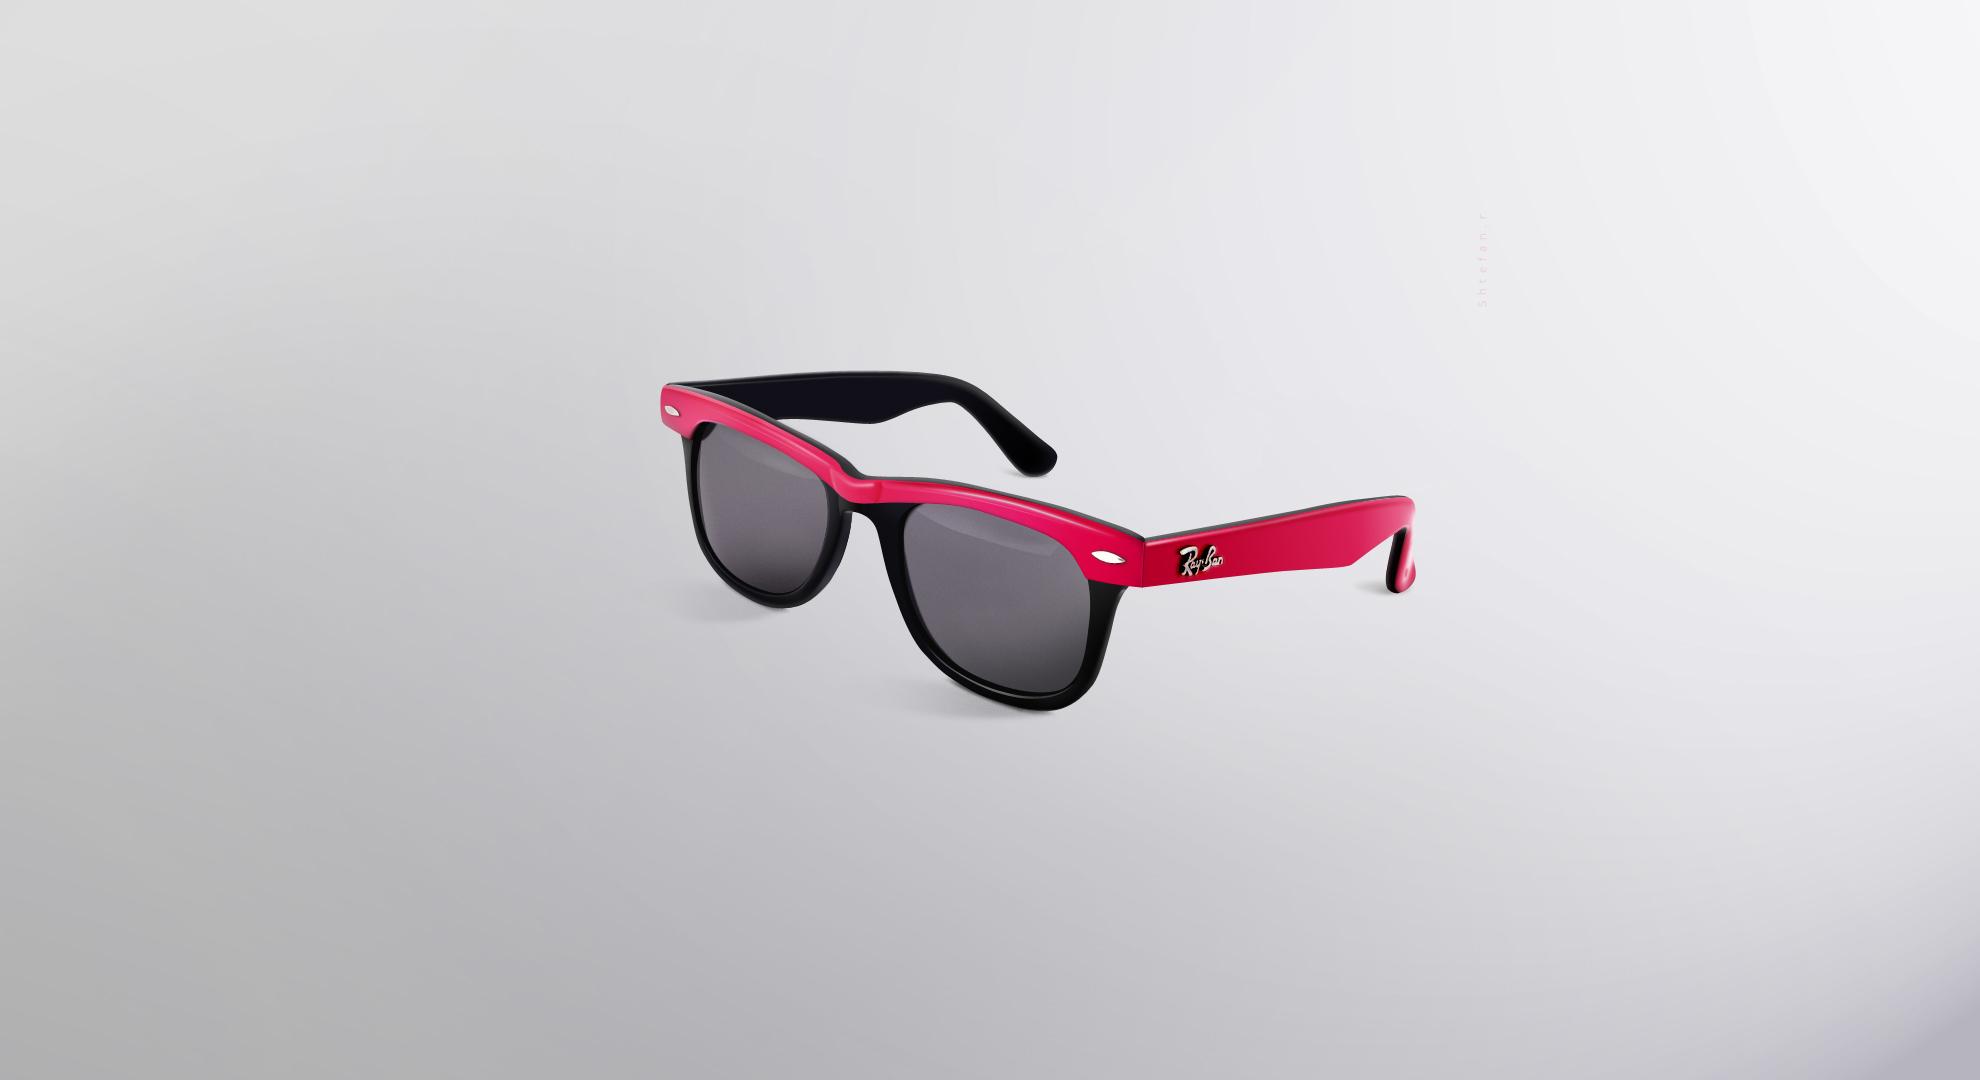 pink sunglasses hd wallpaper